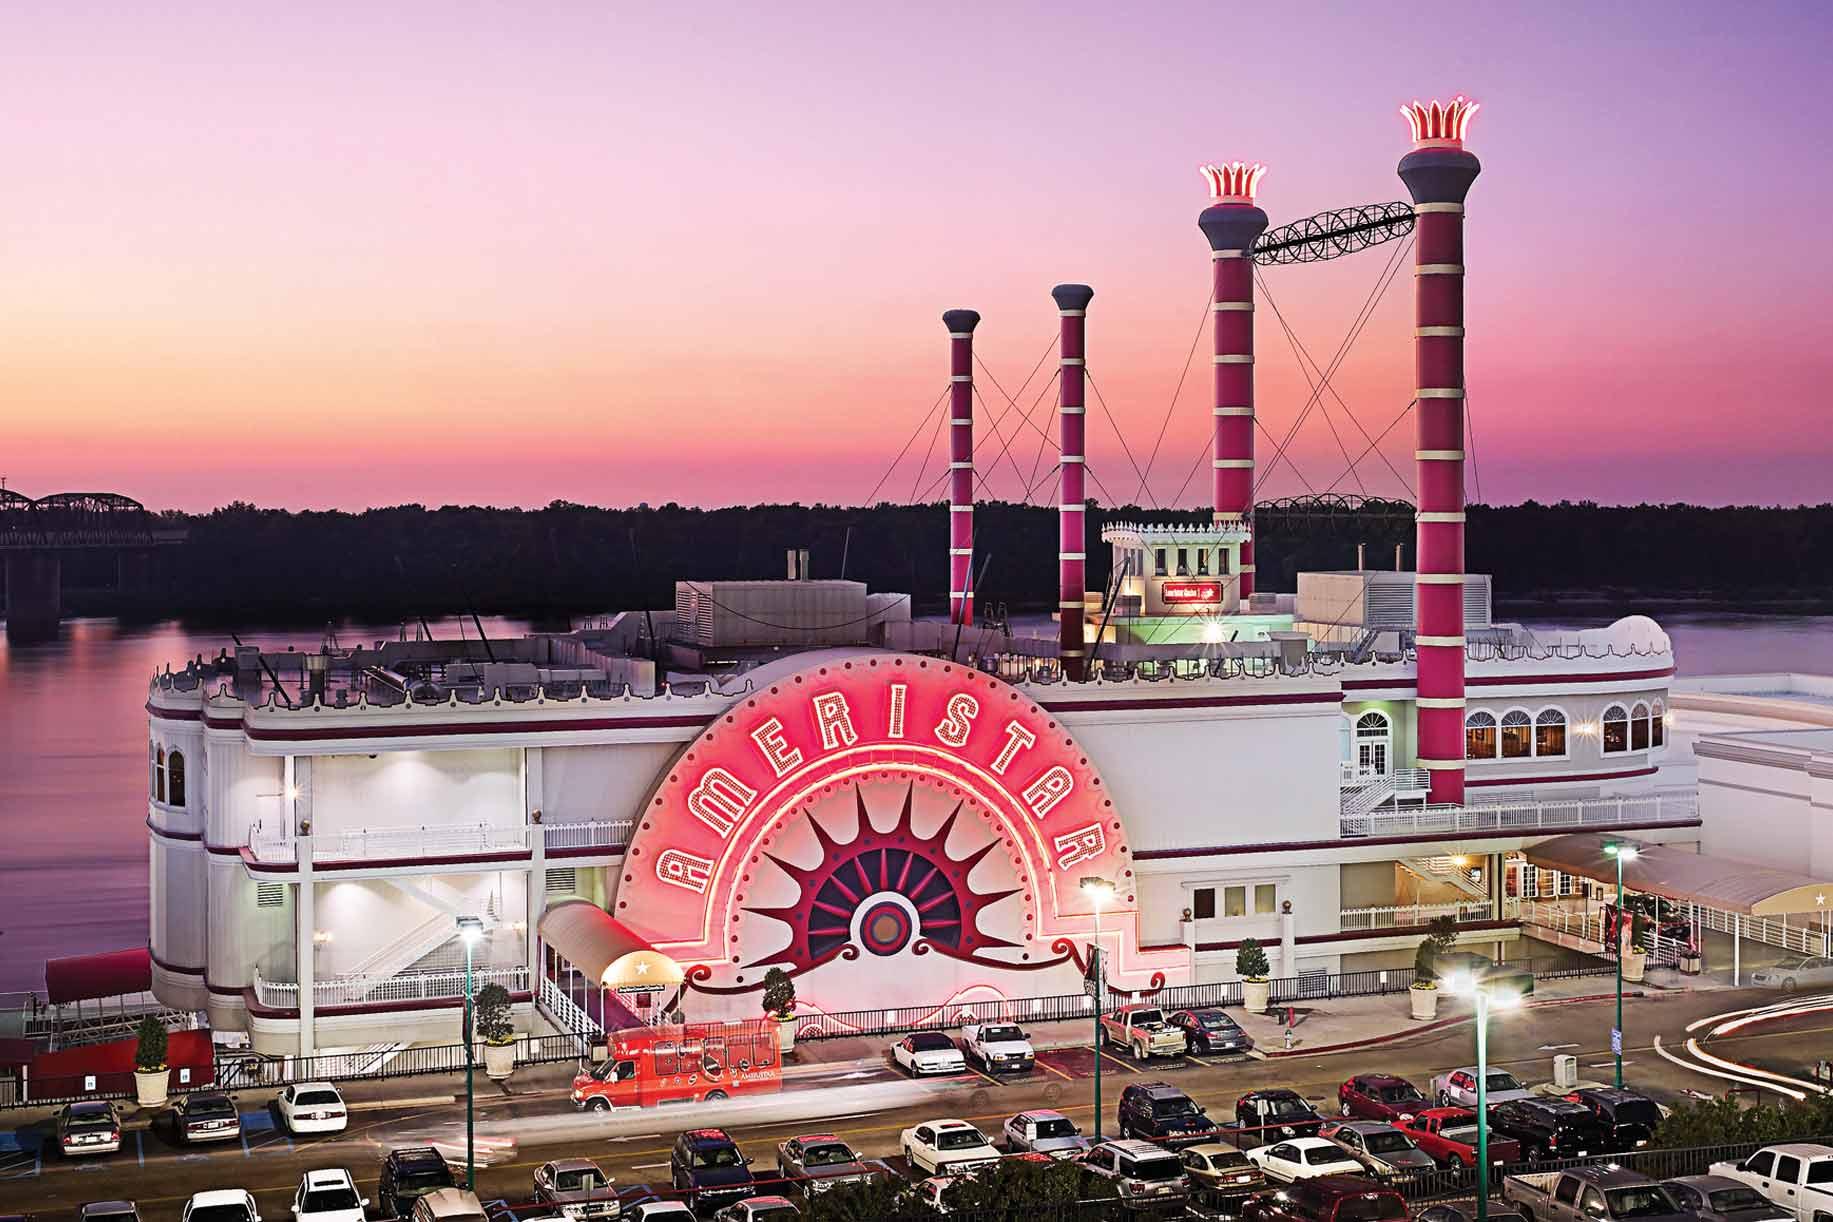 Pinnacle Entertainment's Ameristar Casino Vicksburg riverboat casino